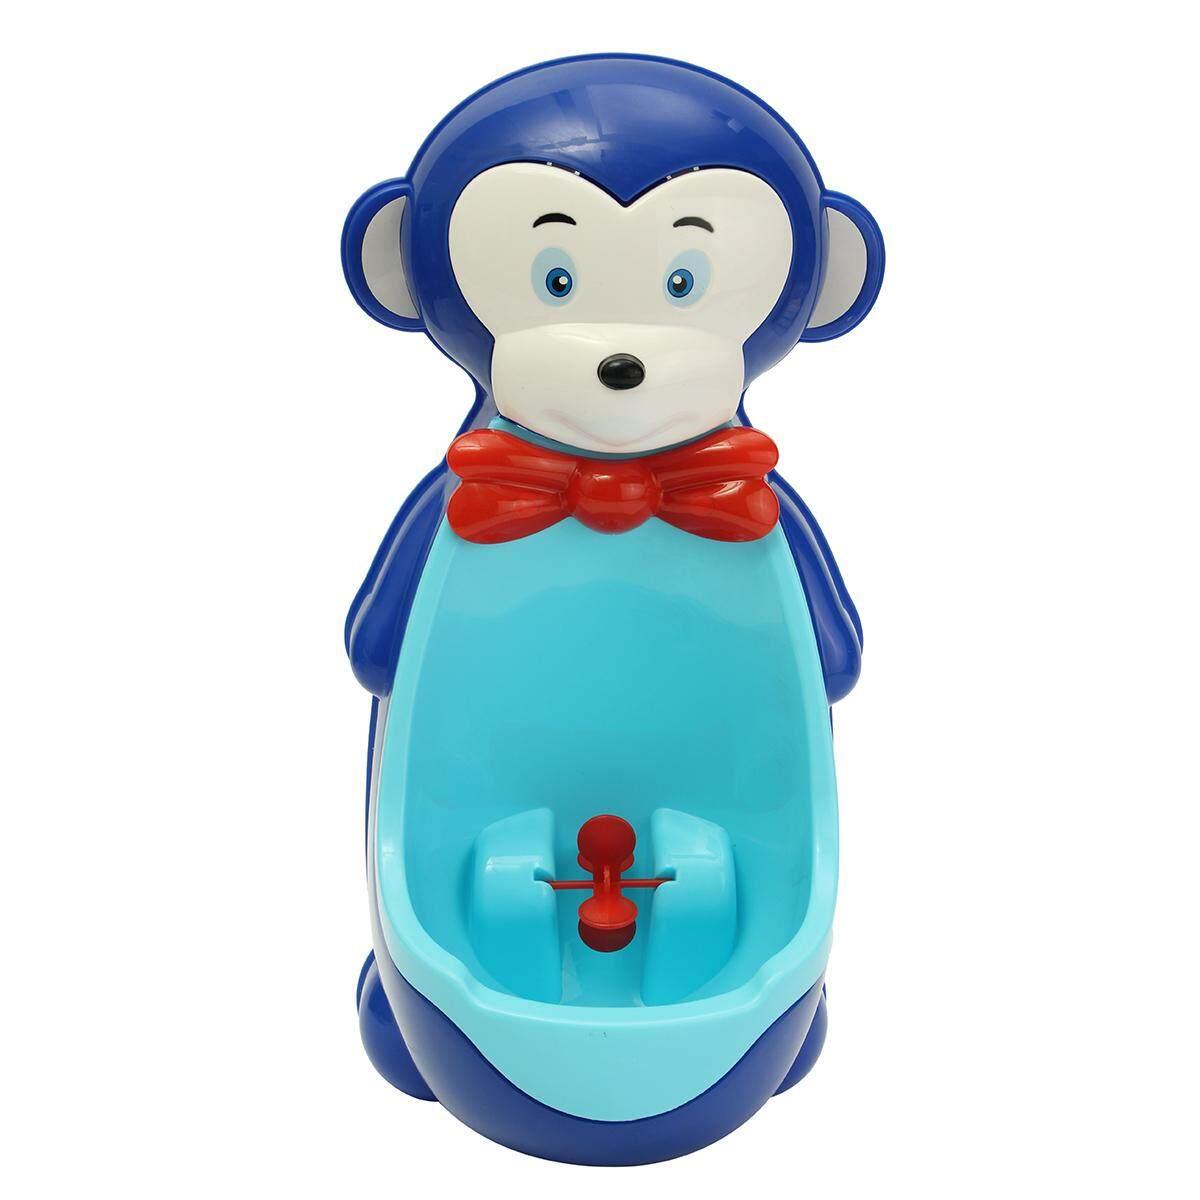 Jual Meja Ganti Bayi Murah Berkualitas Ikea Skotsam Alas Popok 2 Pcs Baby Boys Monkey Toilet Potty Training Kids Toddler Urinal Bathroom Pee Trainerblue